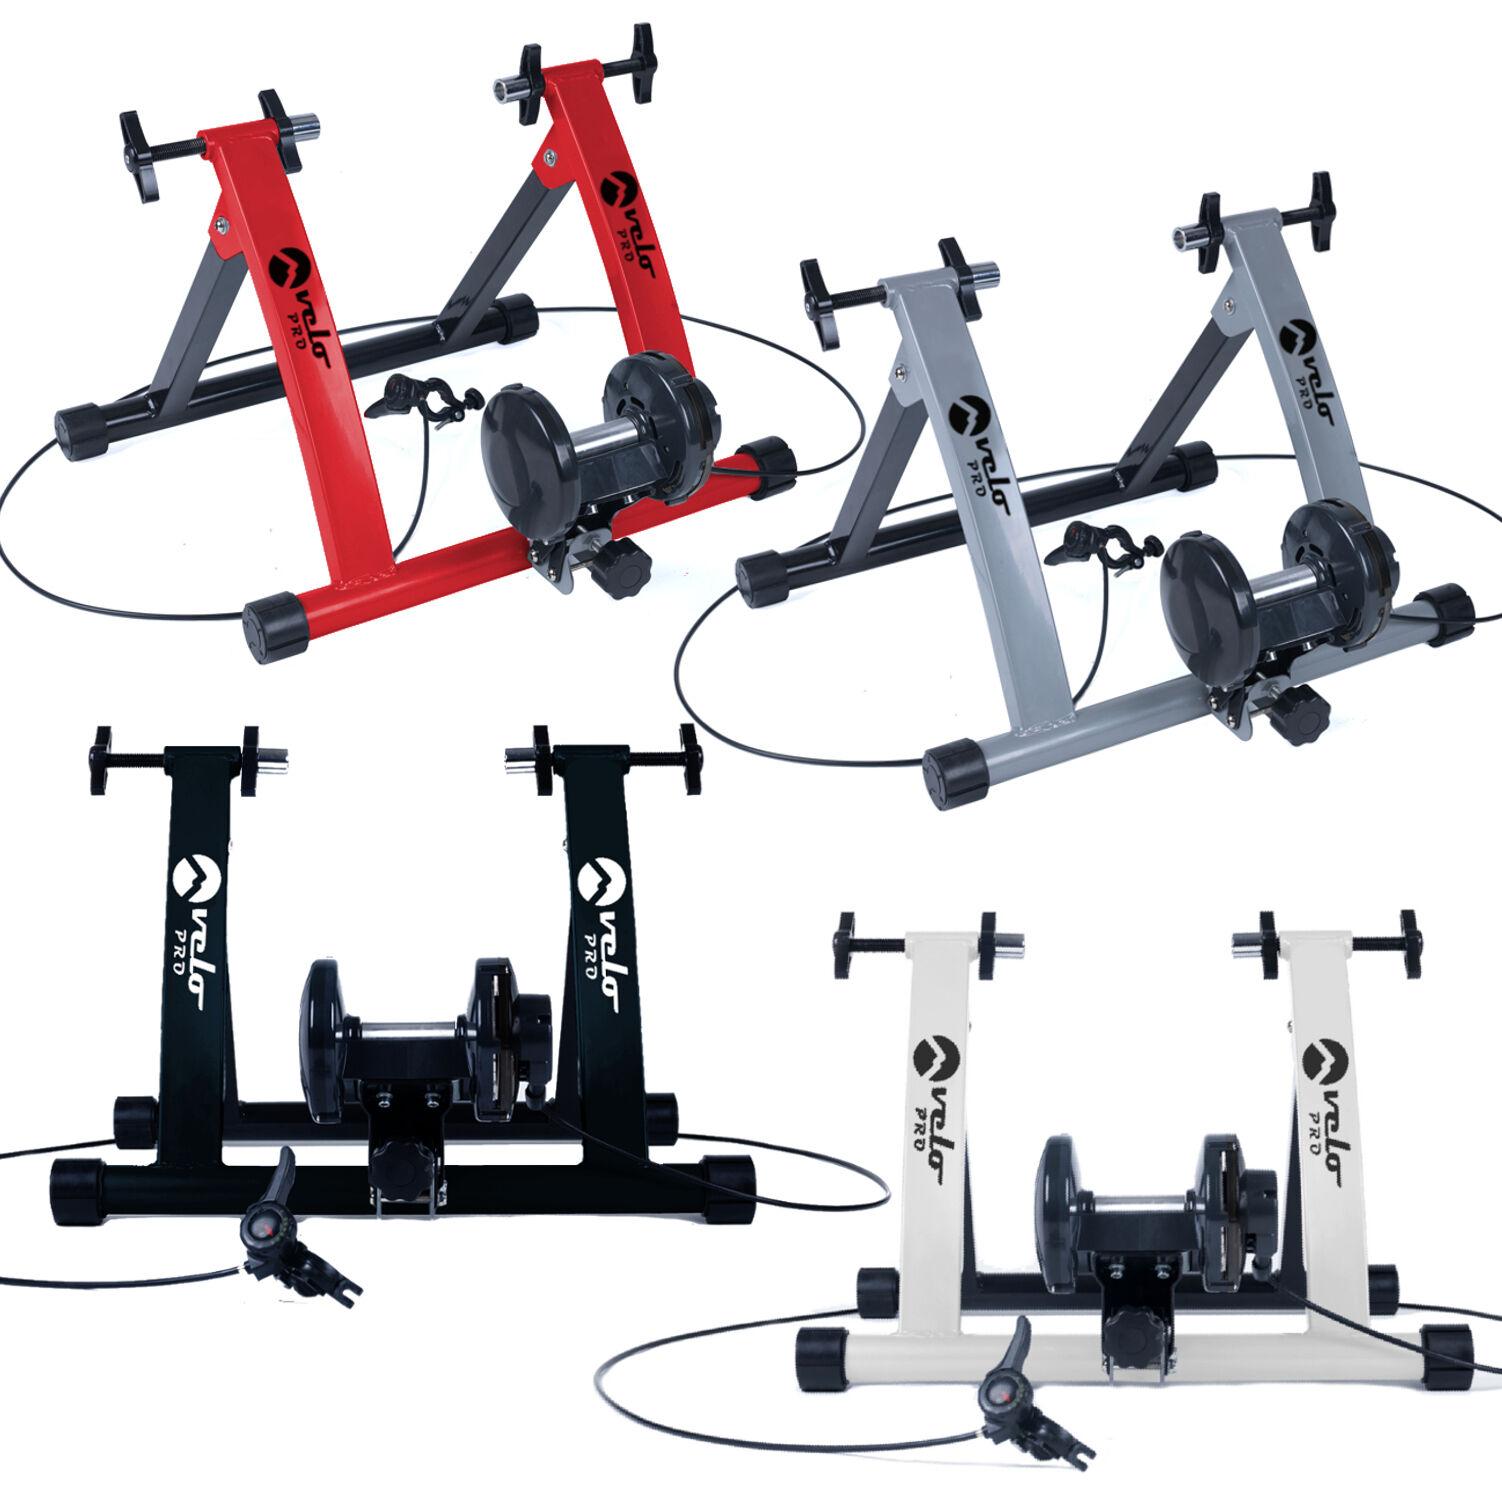 Magnetisch Innen- Turbo Trainer Rennrad Widerstand Training Rad Fahrrad MTB